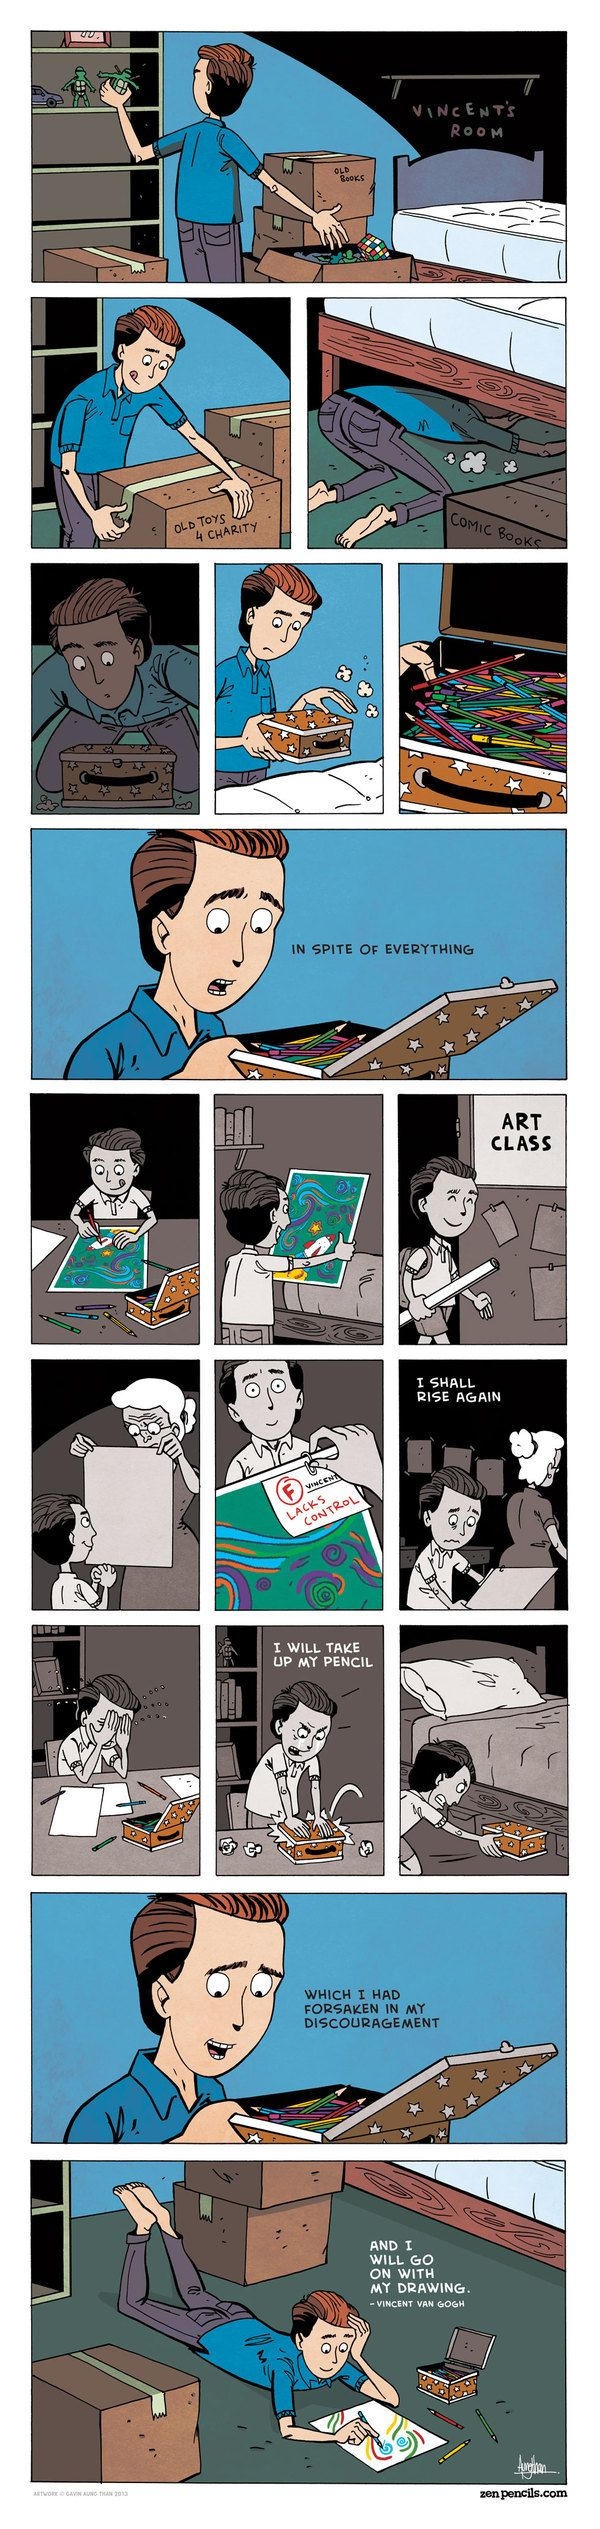 DDDGlobe36's Favorite Comics on GoComics.com